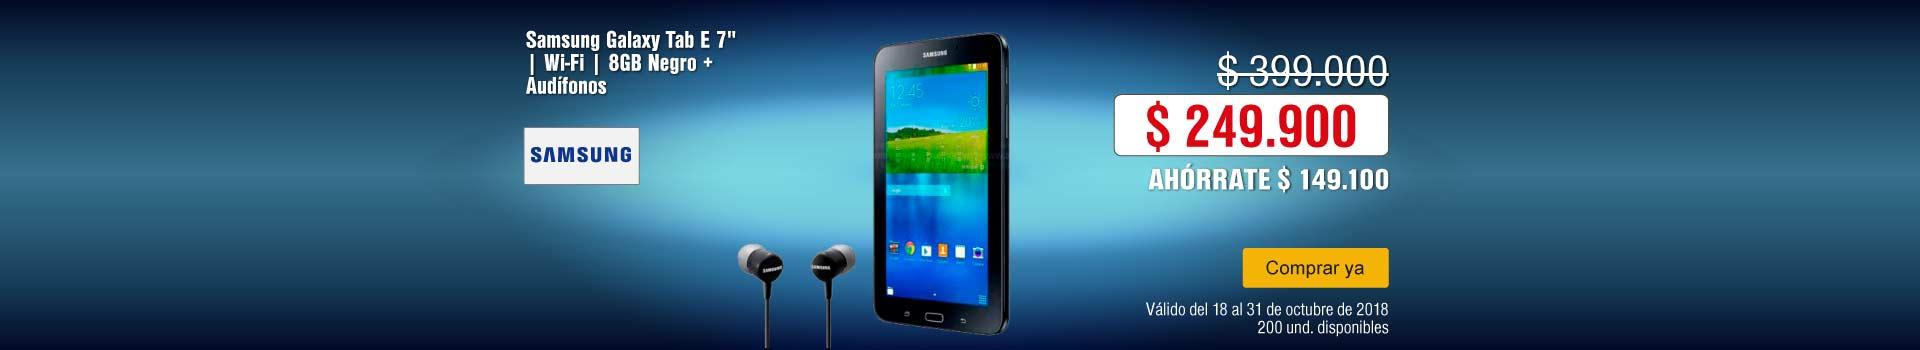 KT-BCAT-1-computadores y tablets-tablet-PP---Samsung-Galaxy Tab E 7